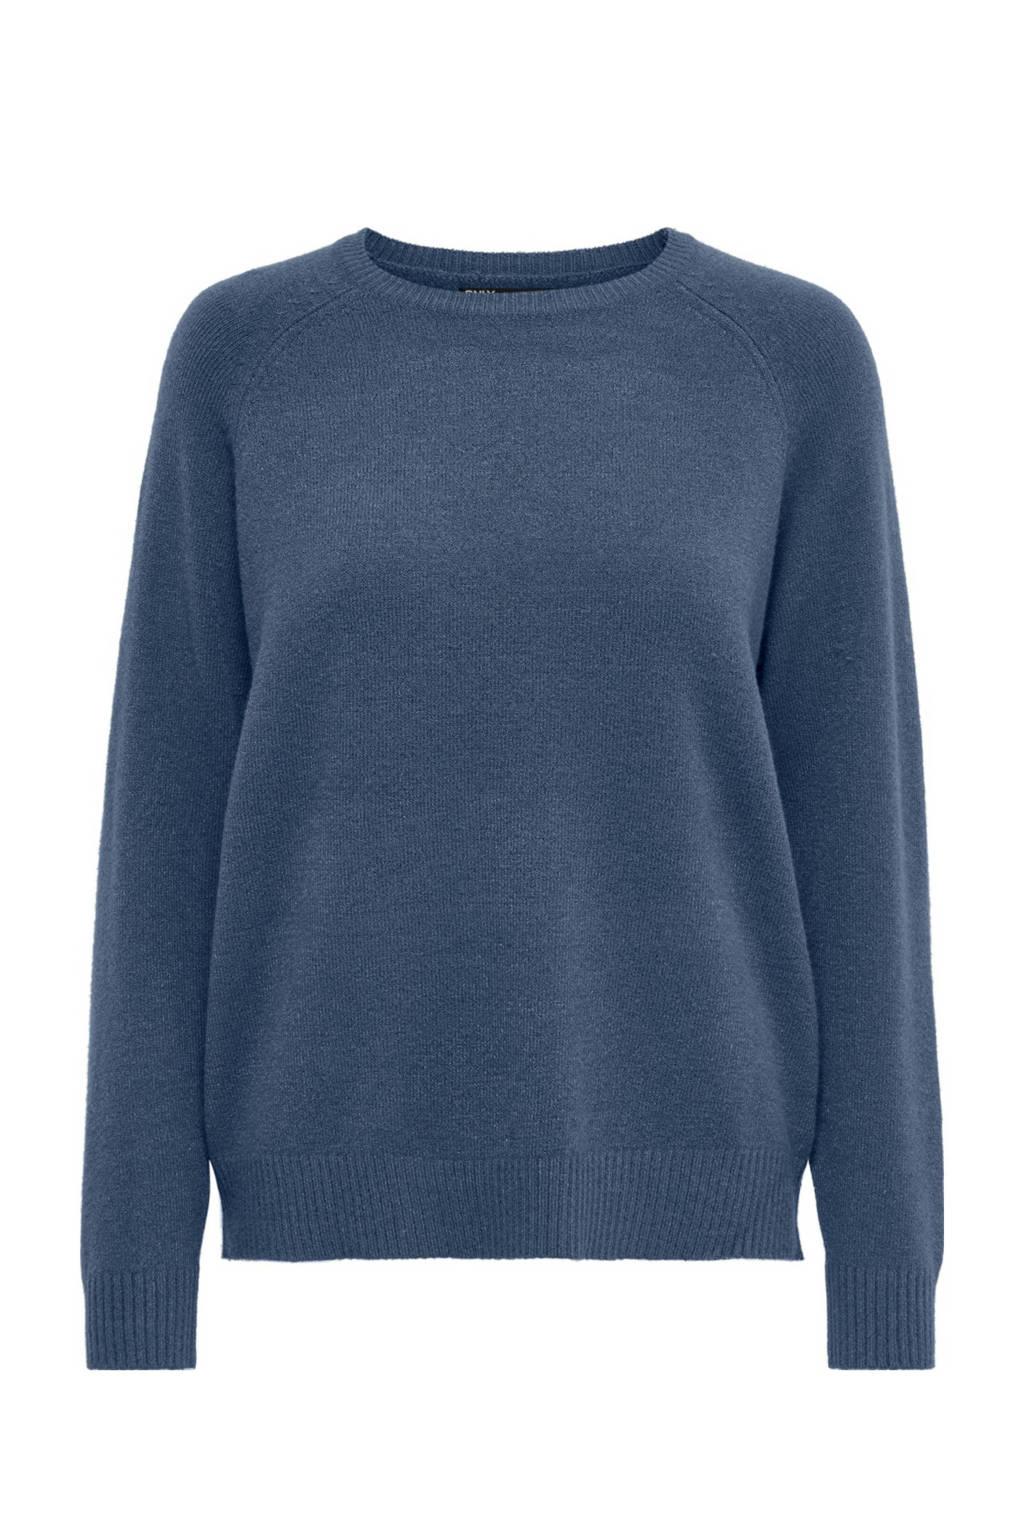 ONLY gemêleerde trui blauw, Blauw